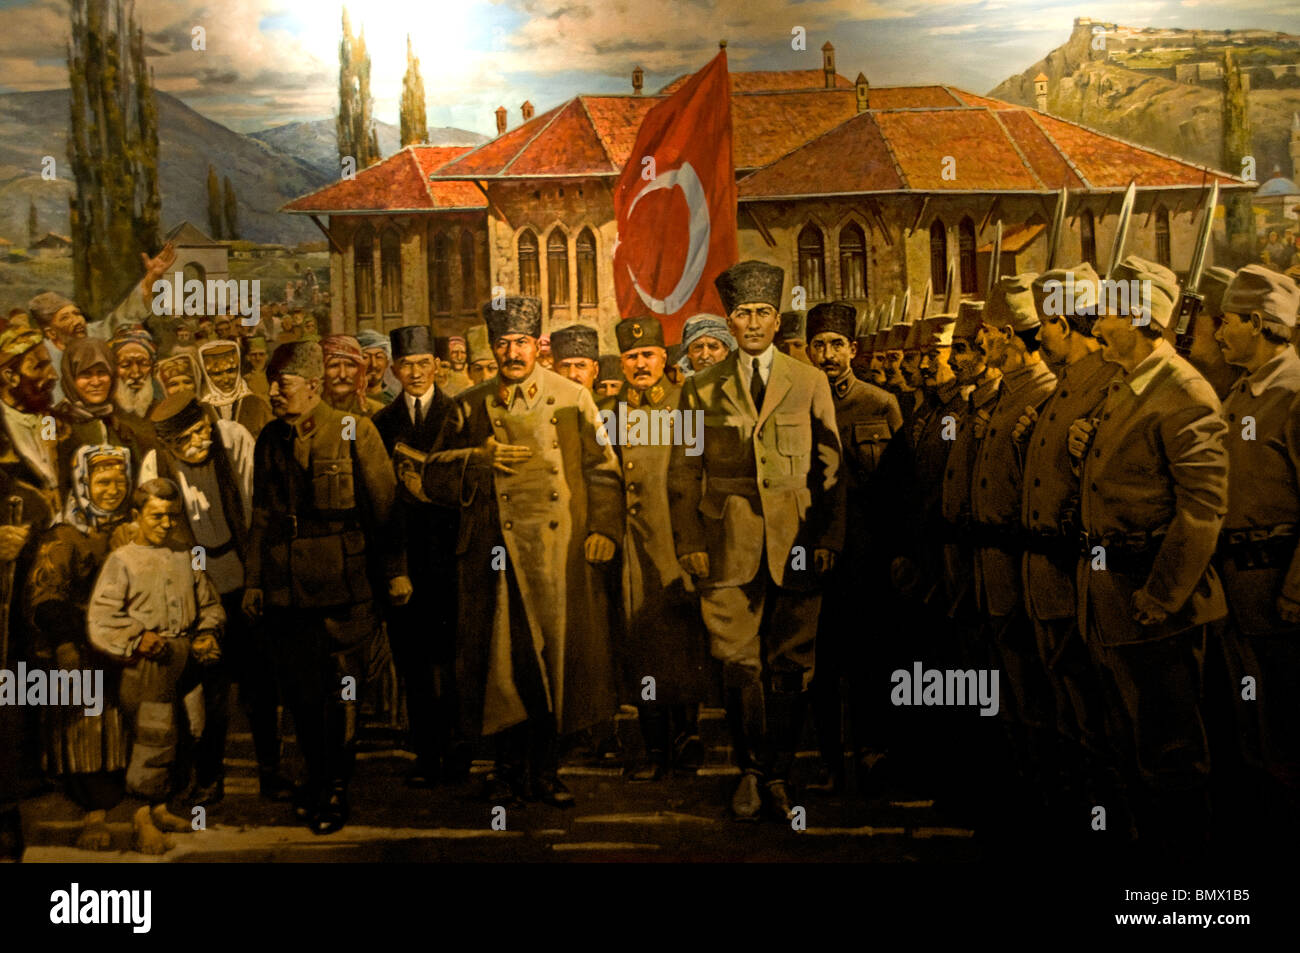 turkish war of independence essay Turkish war of independence's wiki: the turkish war of independence (turkish: kurtuluş savaşı war of liberation, also known figuratively as i̇stiklâl harbi independence war or millî mücadele national campaign may 19, 1919 – july 24, 1923) was fought between the turkish national moveme.